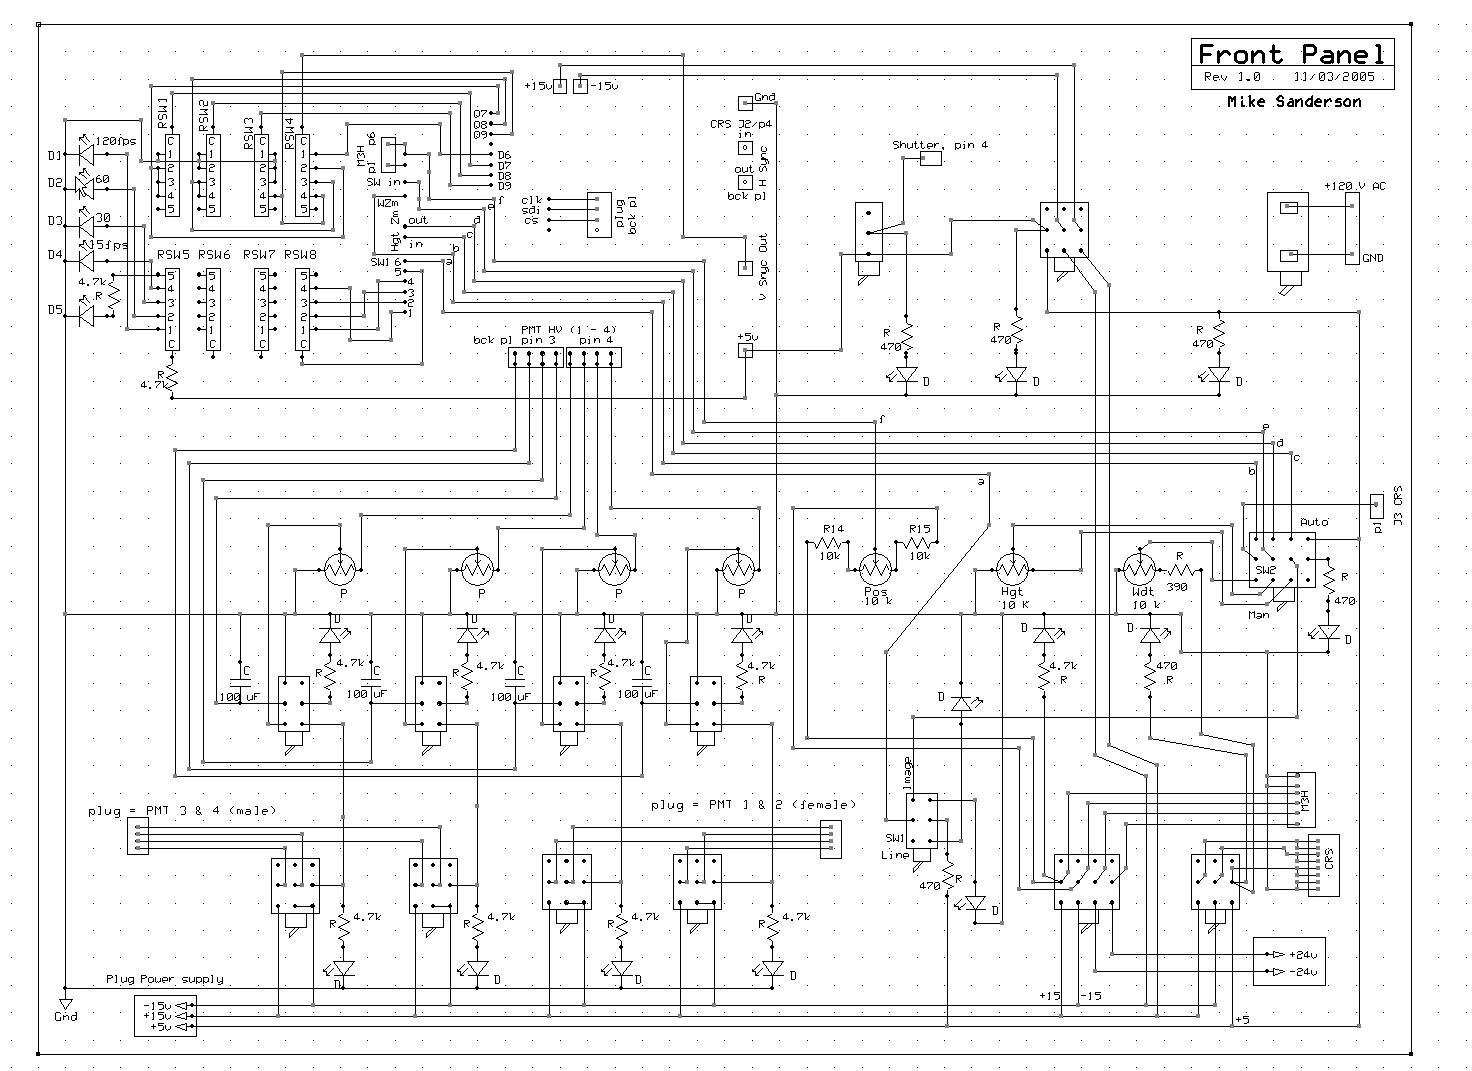 Caterpillar generator wiring diagram wiring rv power transfer switch wiring diagram for olympian generator love wiring diagram ideas front20panel20schematic wiring diagram cheapraybanclubmaster Gallery